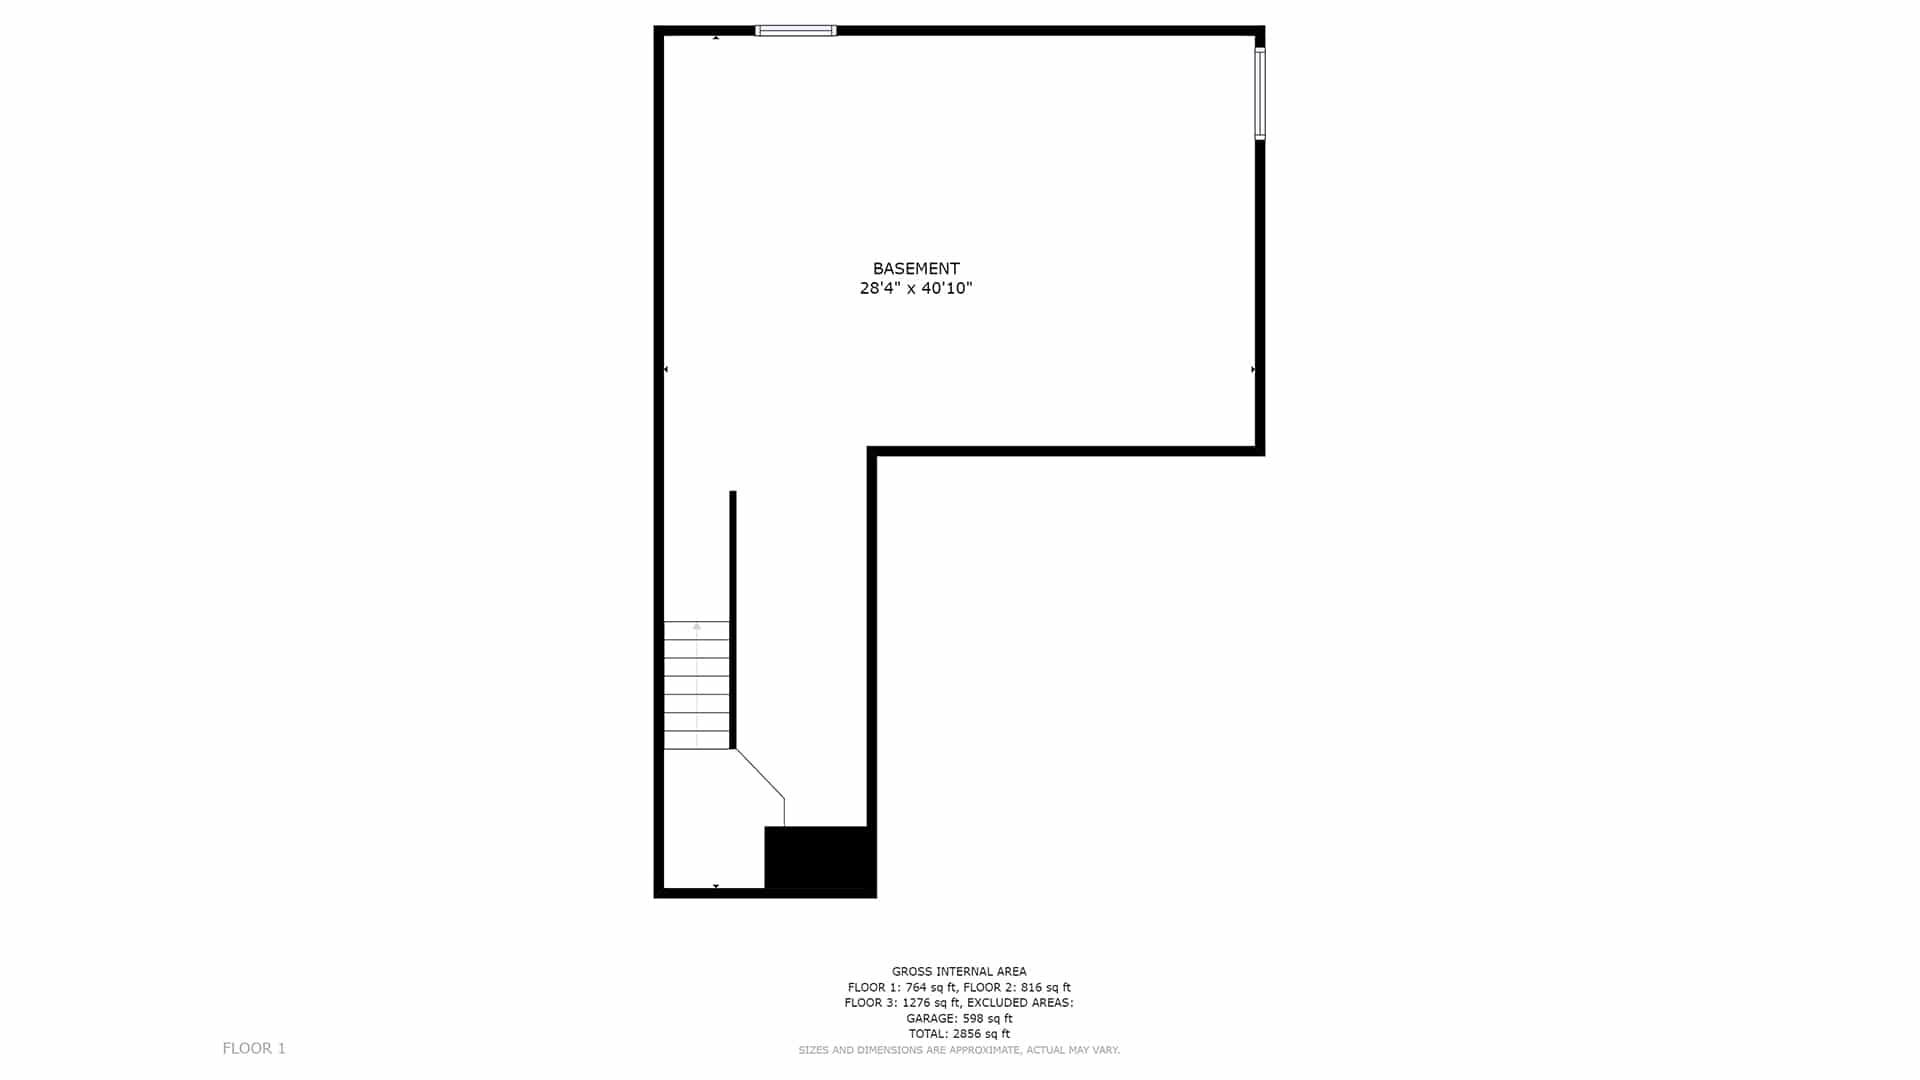 Commerce City Home For Sale Basement Floor Plan